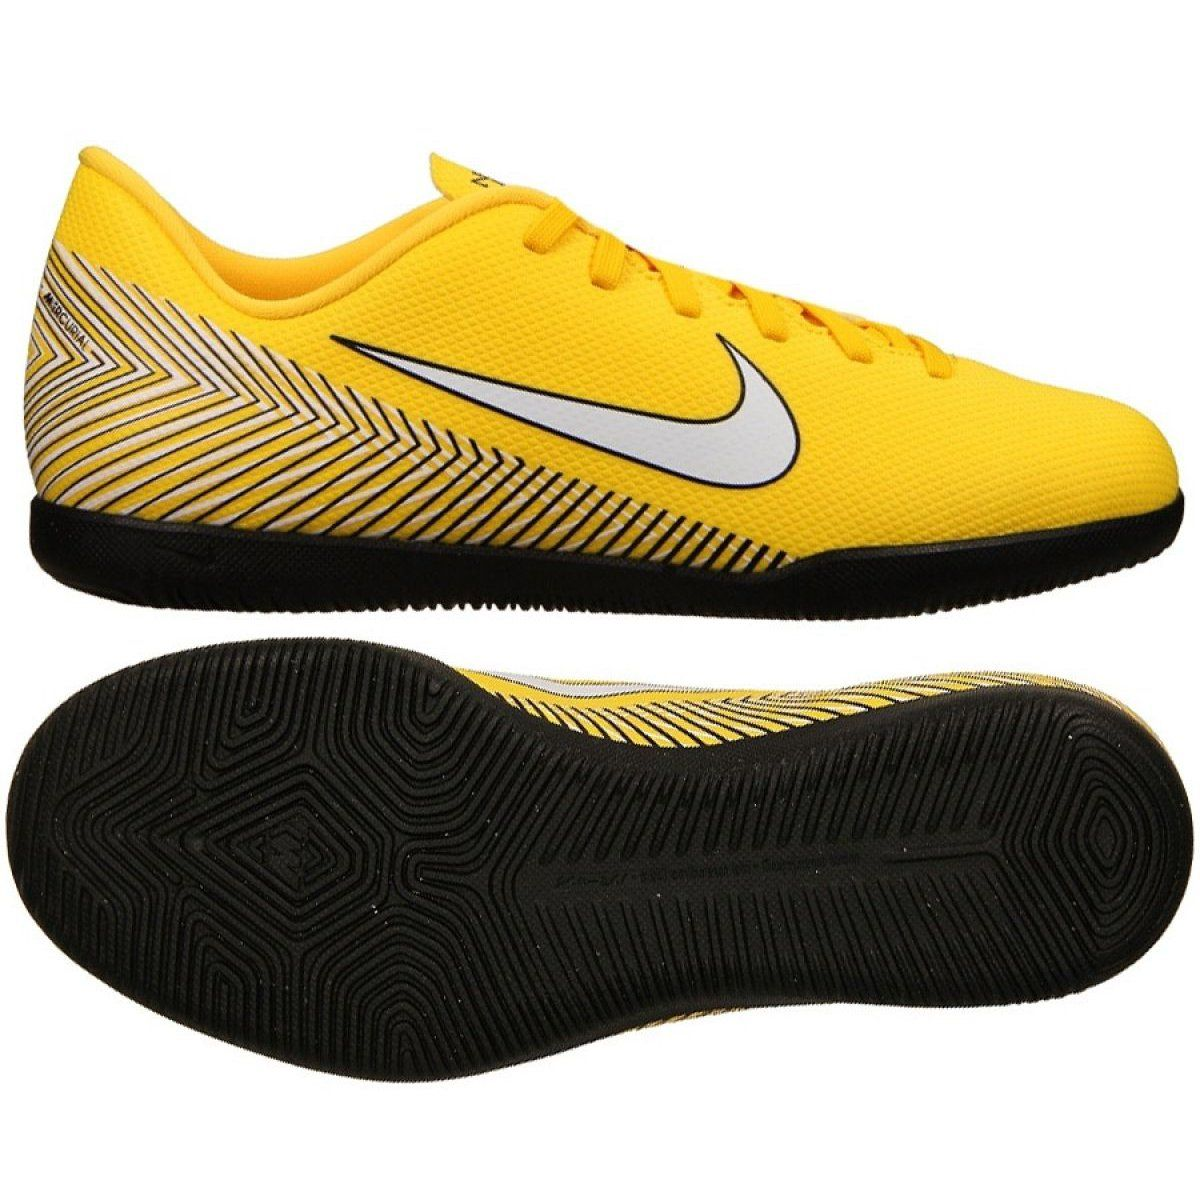 Buty Pilkarskie Nike Mercurial Vapor 12 Zolte Zolte Football Shoes Nike Football Boots Nike